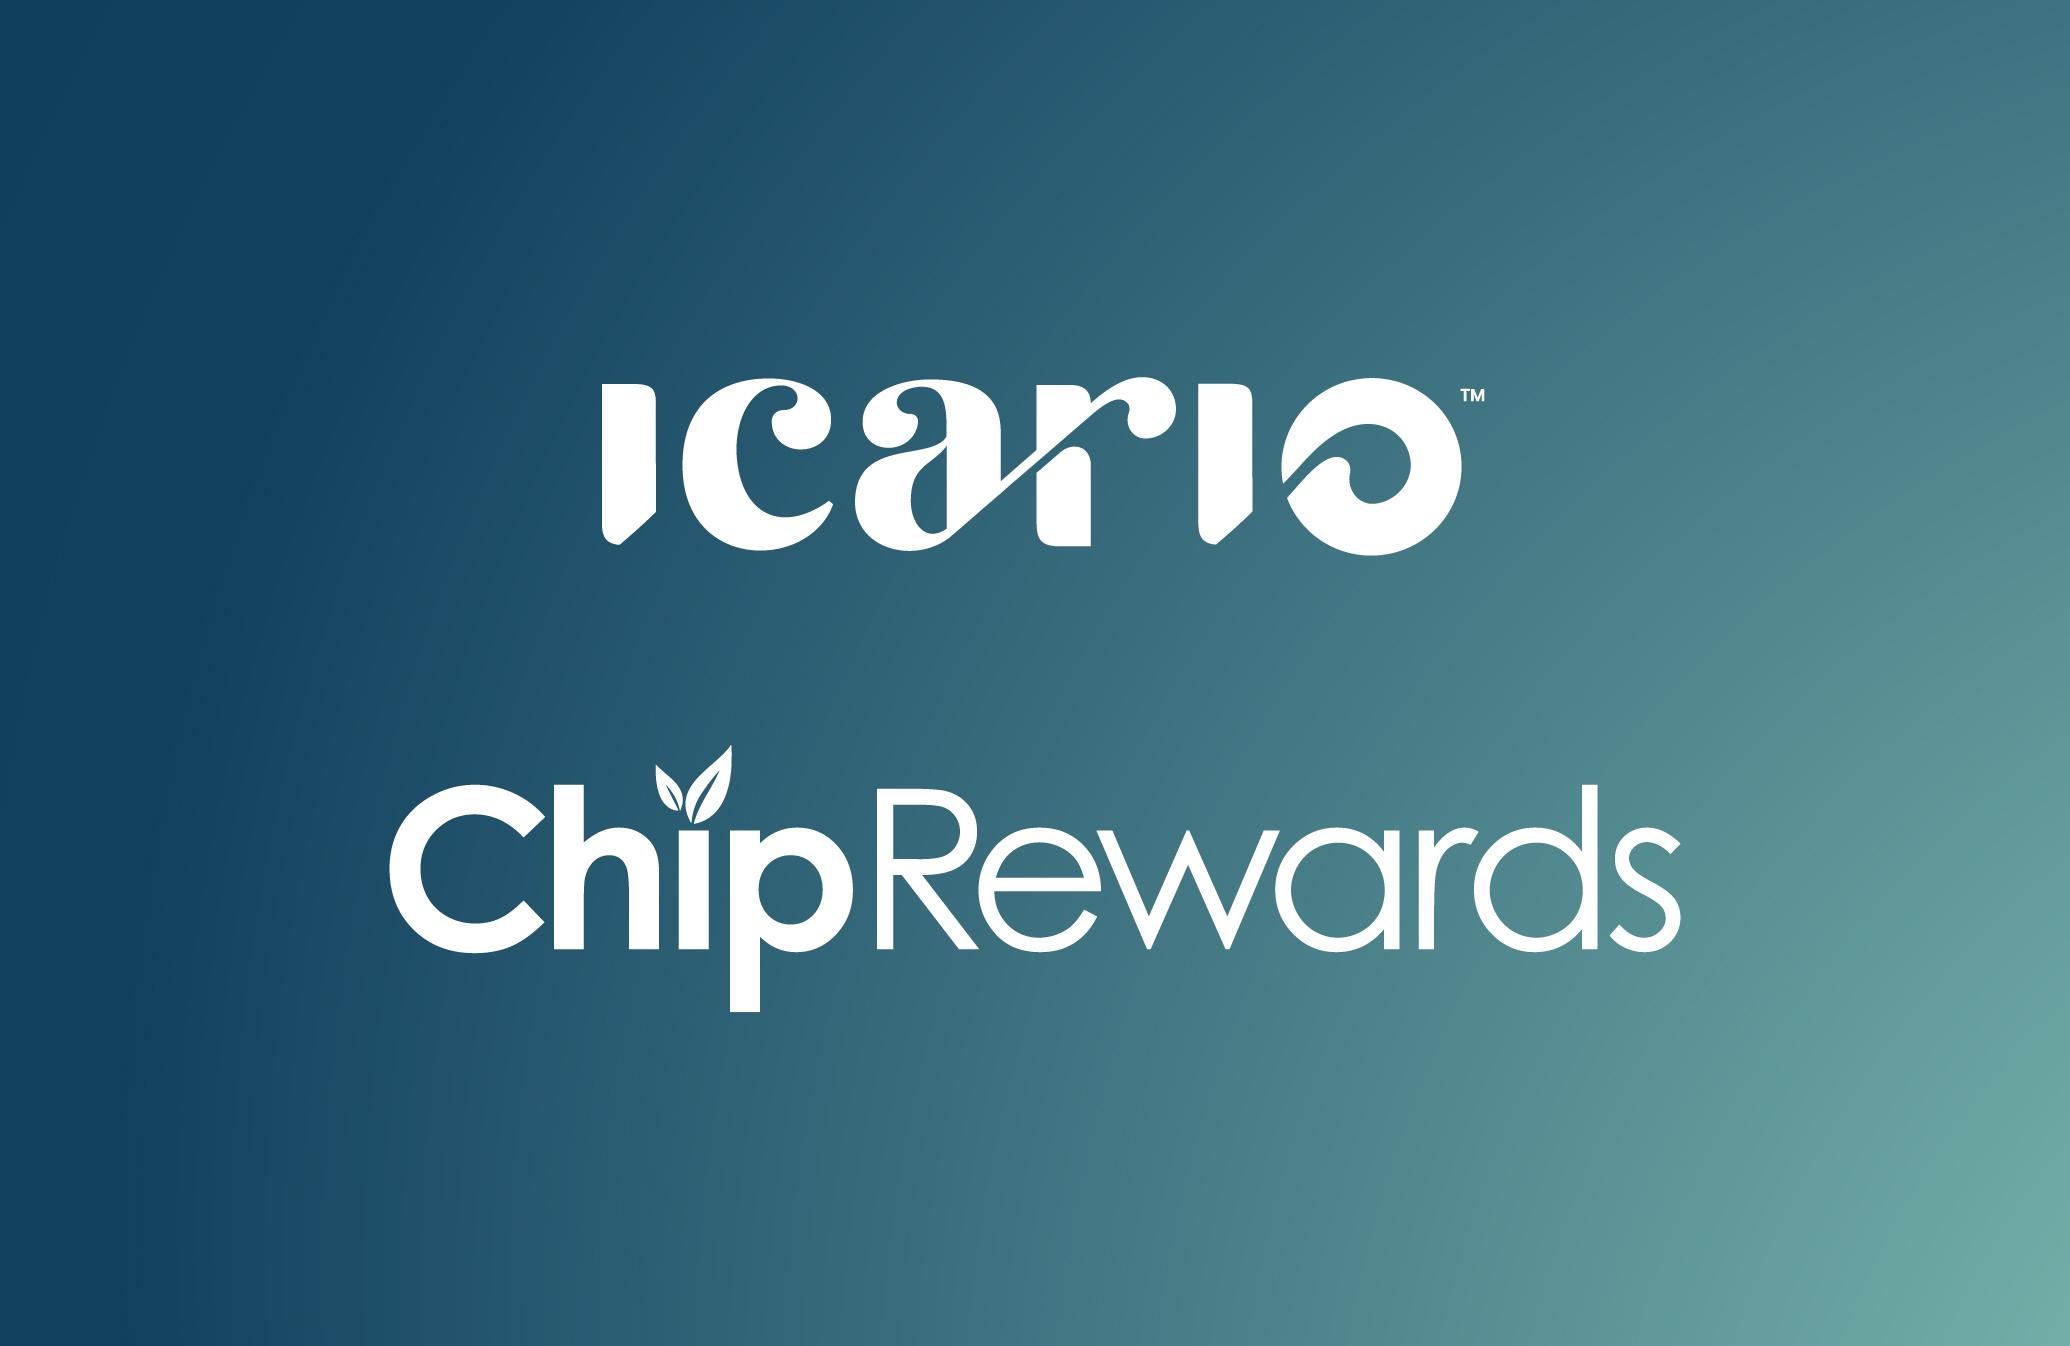 Icario and ChipRewards